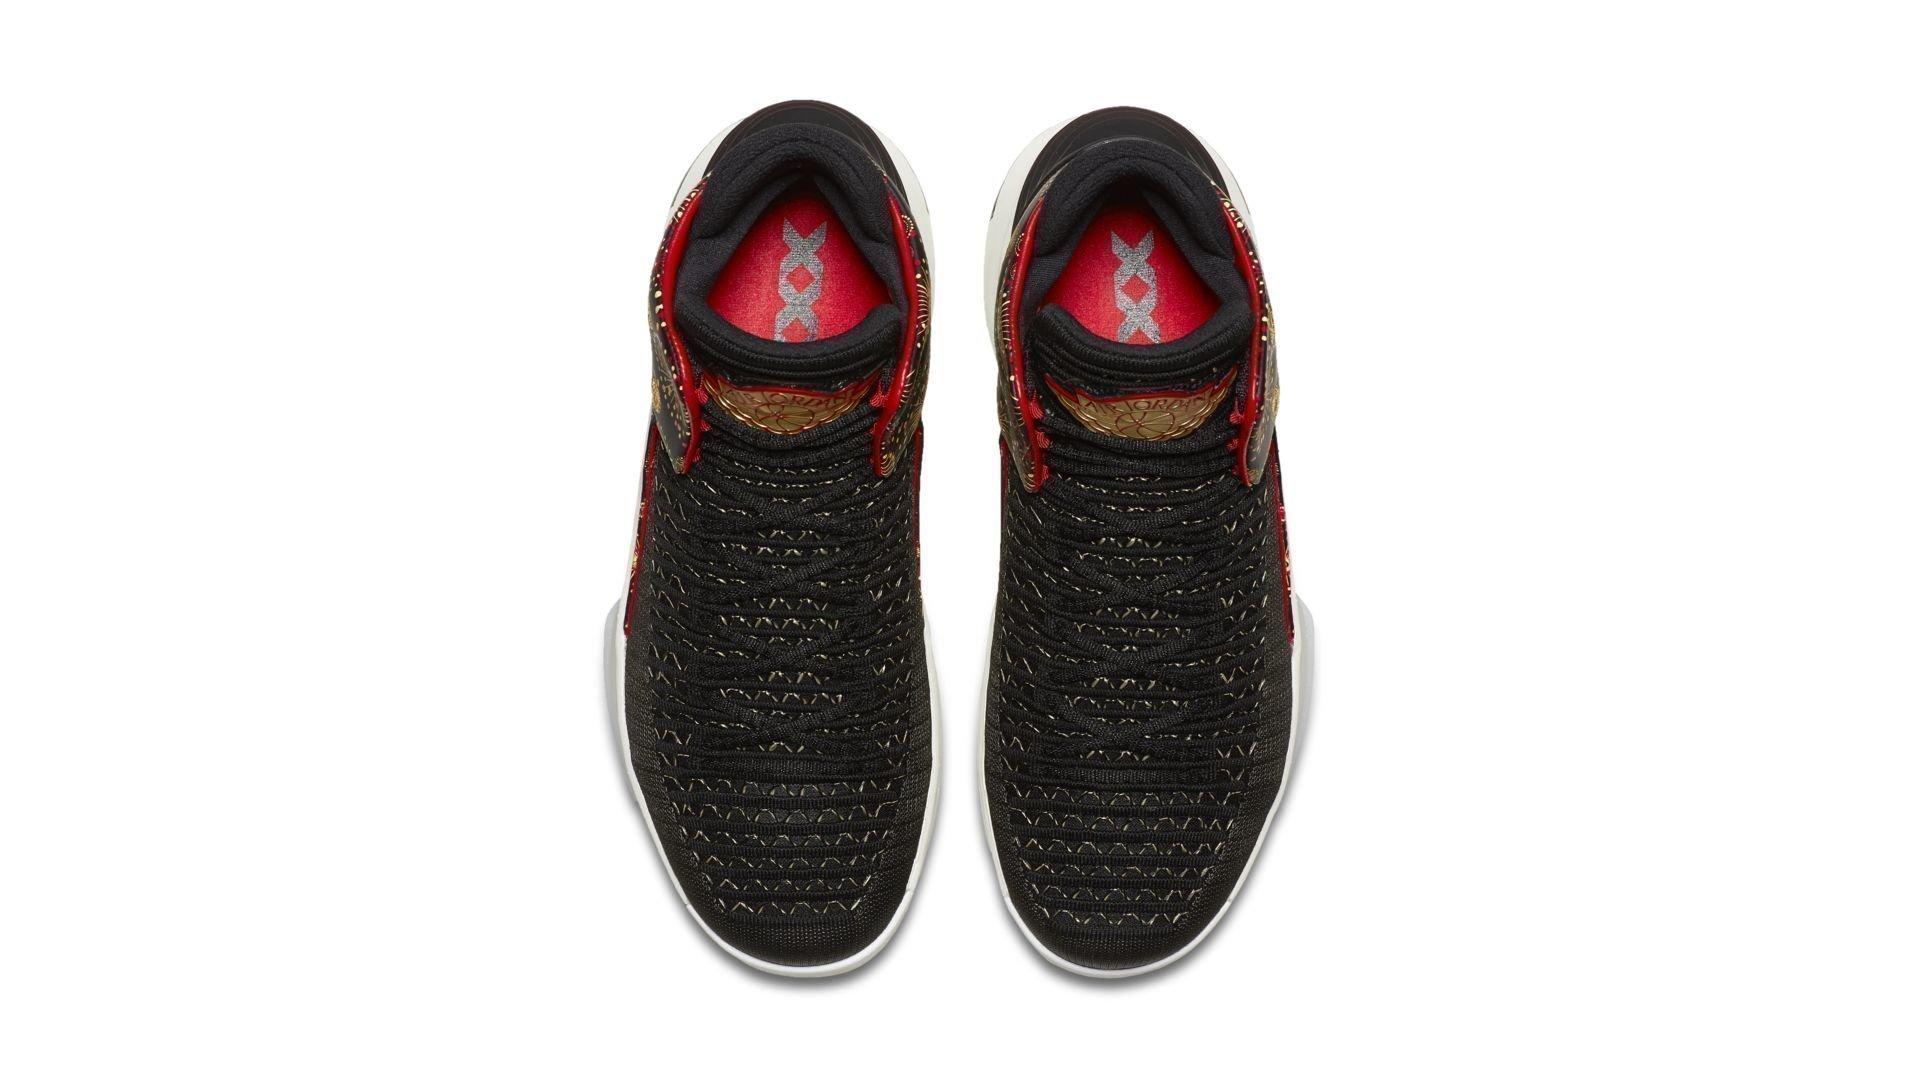 Jordan XXXII Chinese New Year 2018 (China Release) (AJ6333-042)